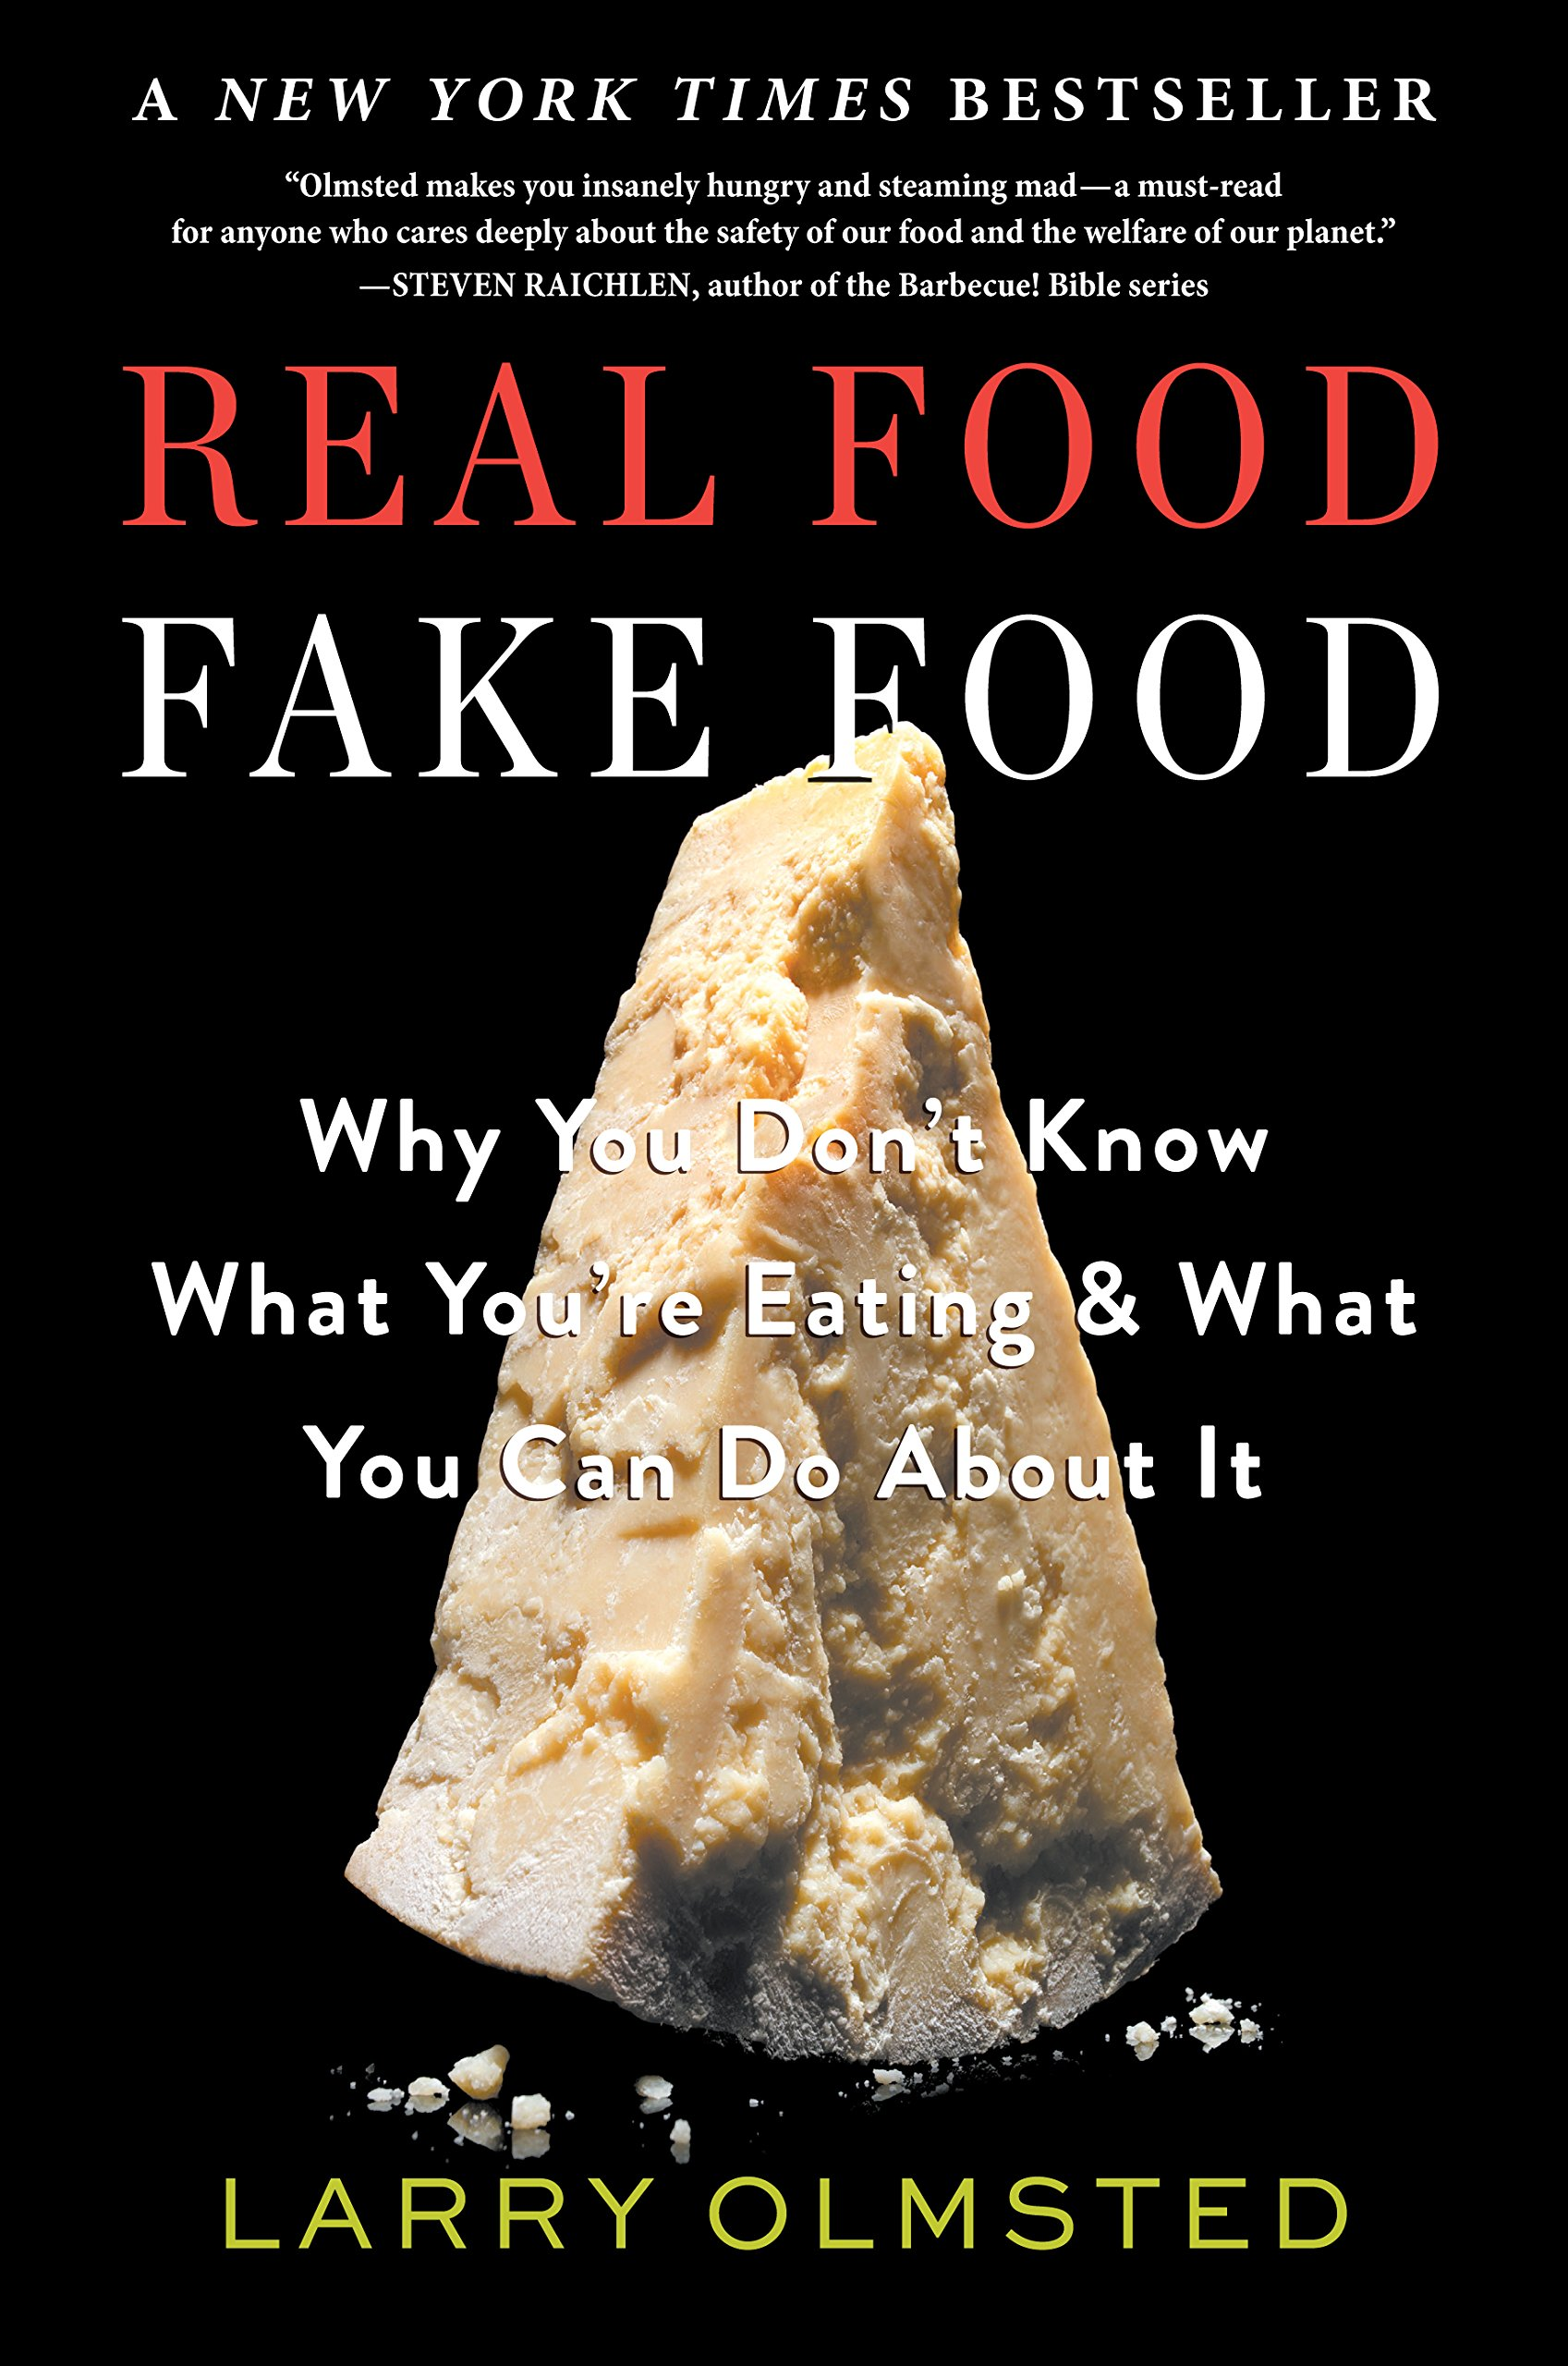 Fake Food Reviews & Ratings  Amazon